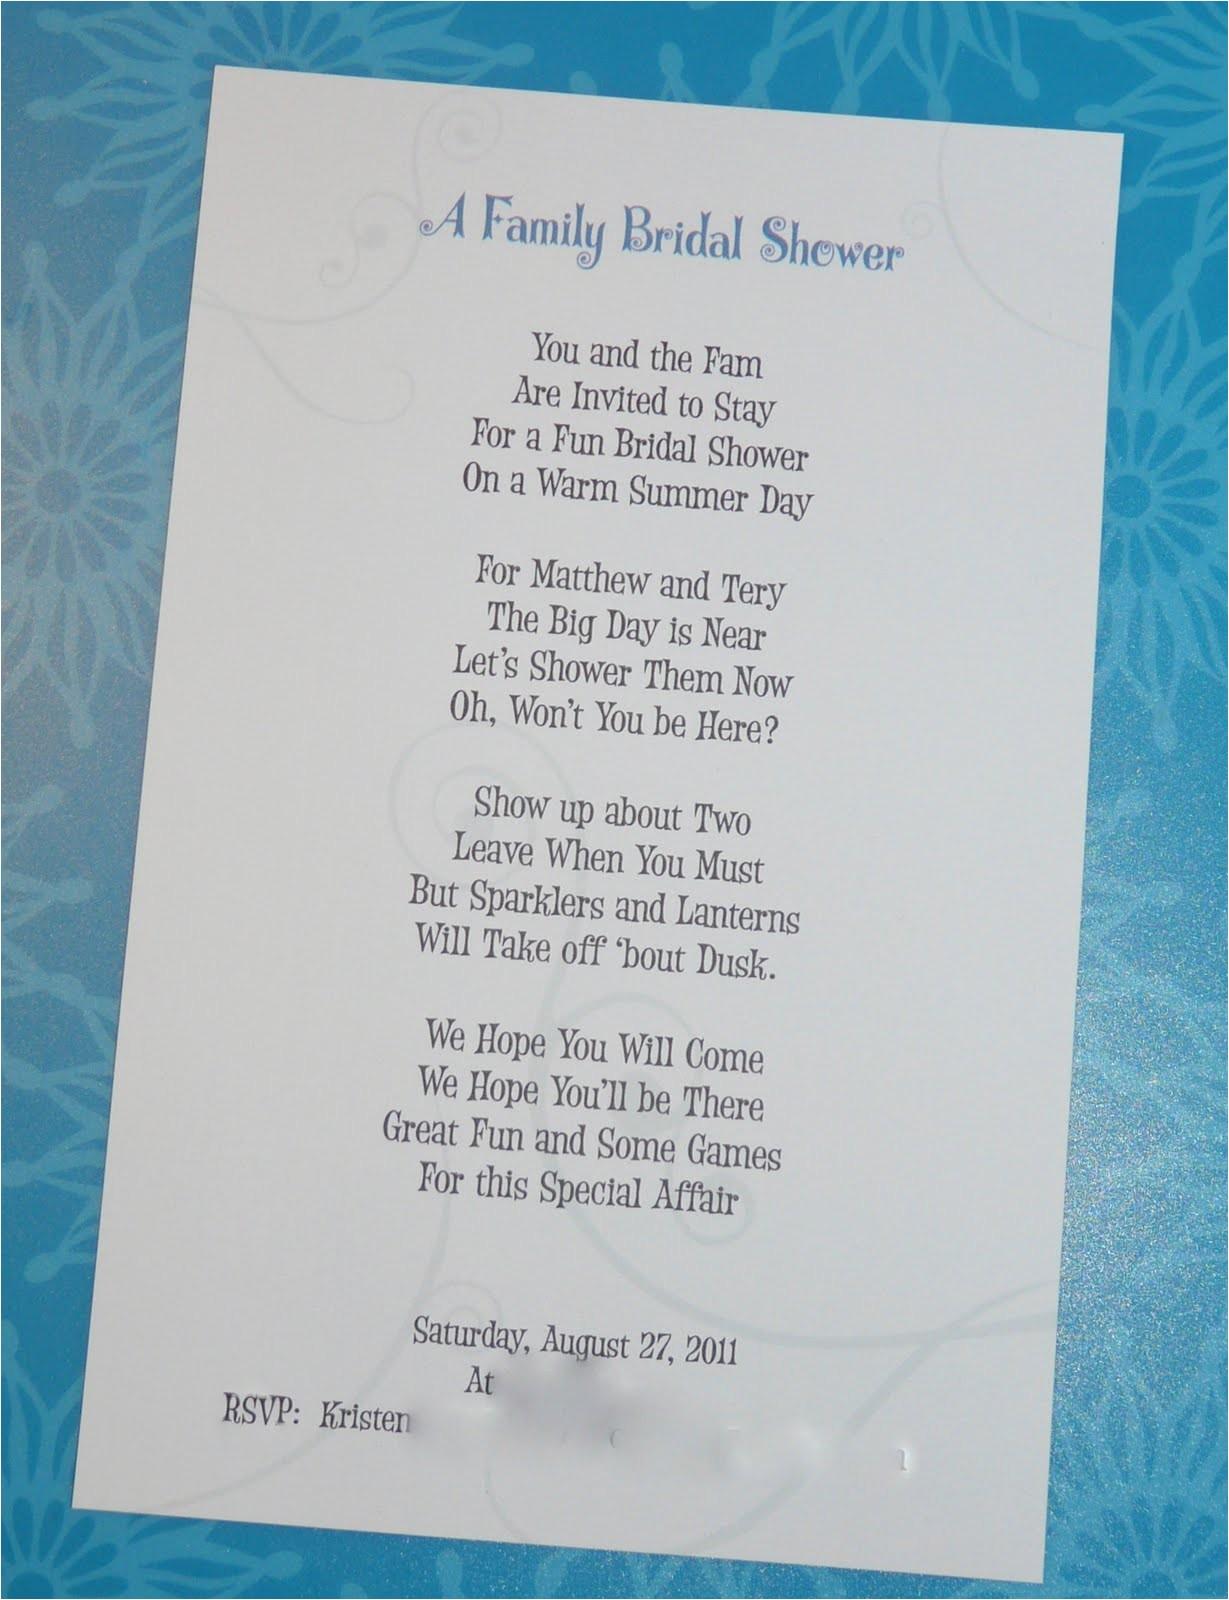 Bridal Shower Invitation Poems Writing A Bridal Shower Invitation Poem Celebrate Every